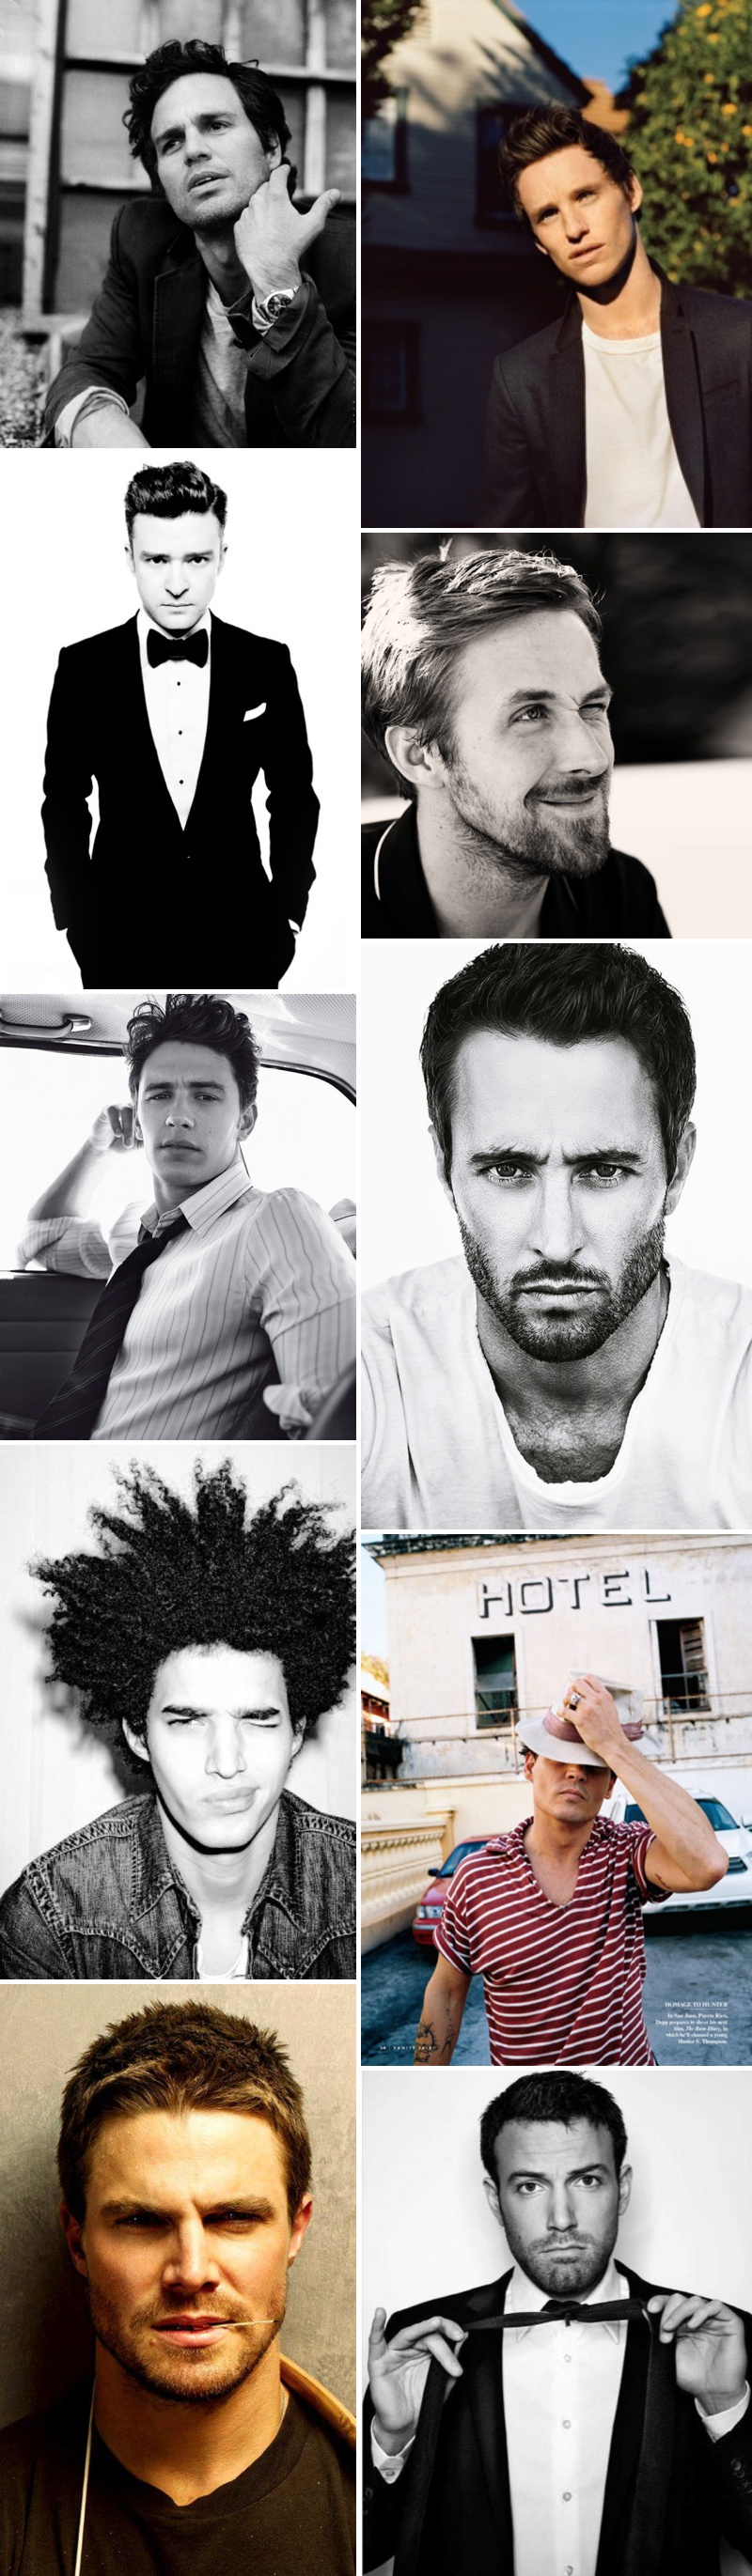 Hot Hommes